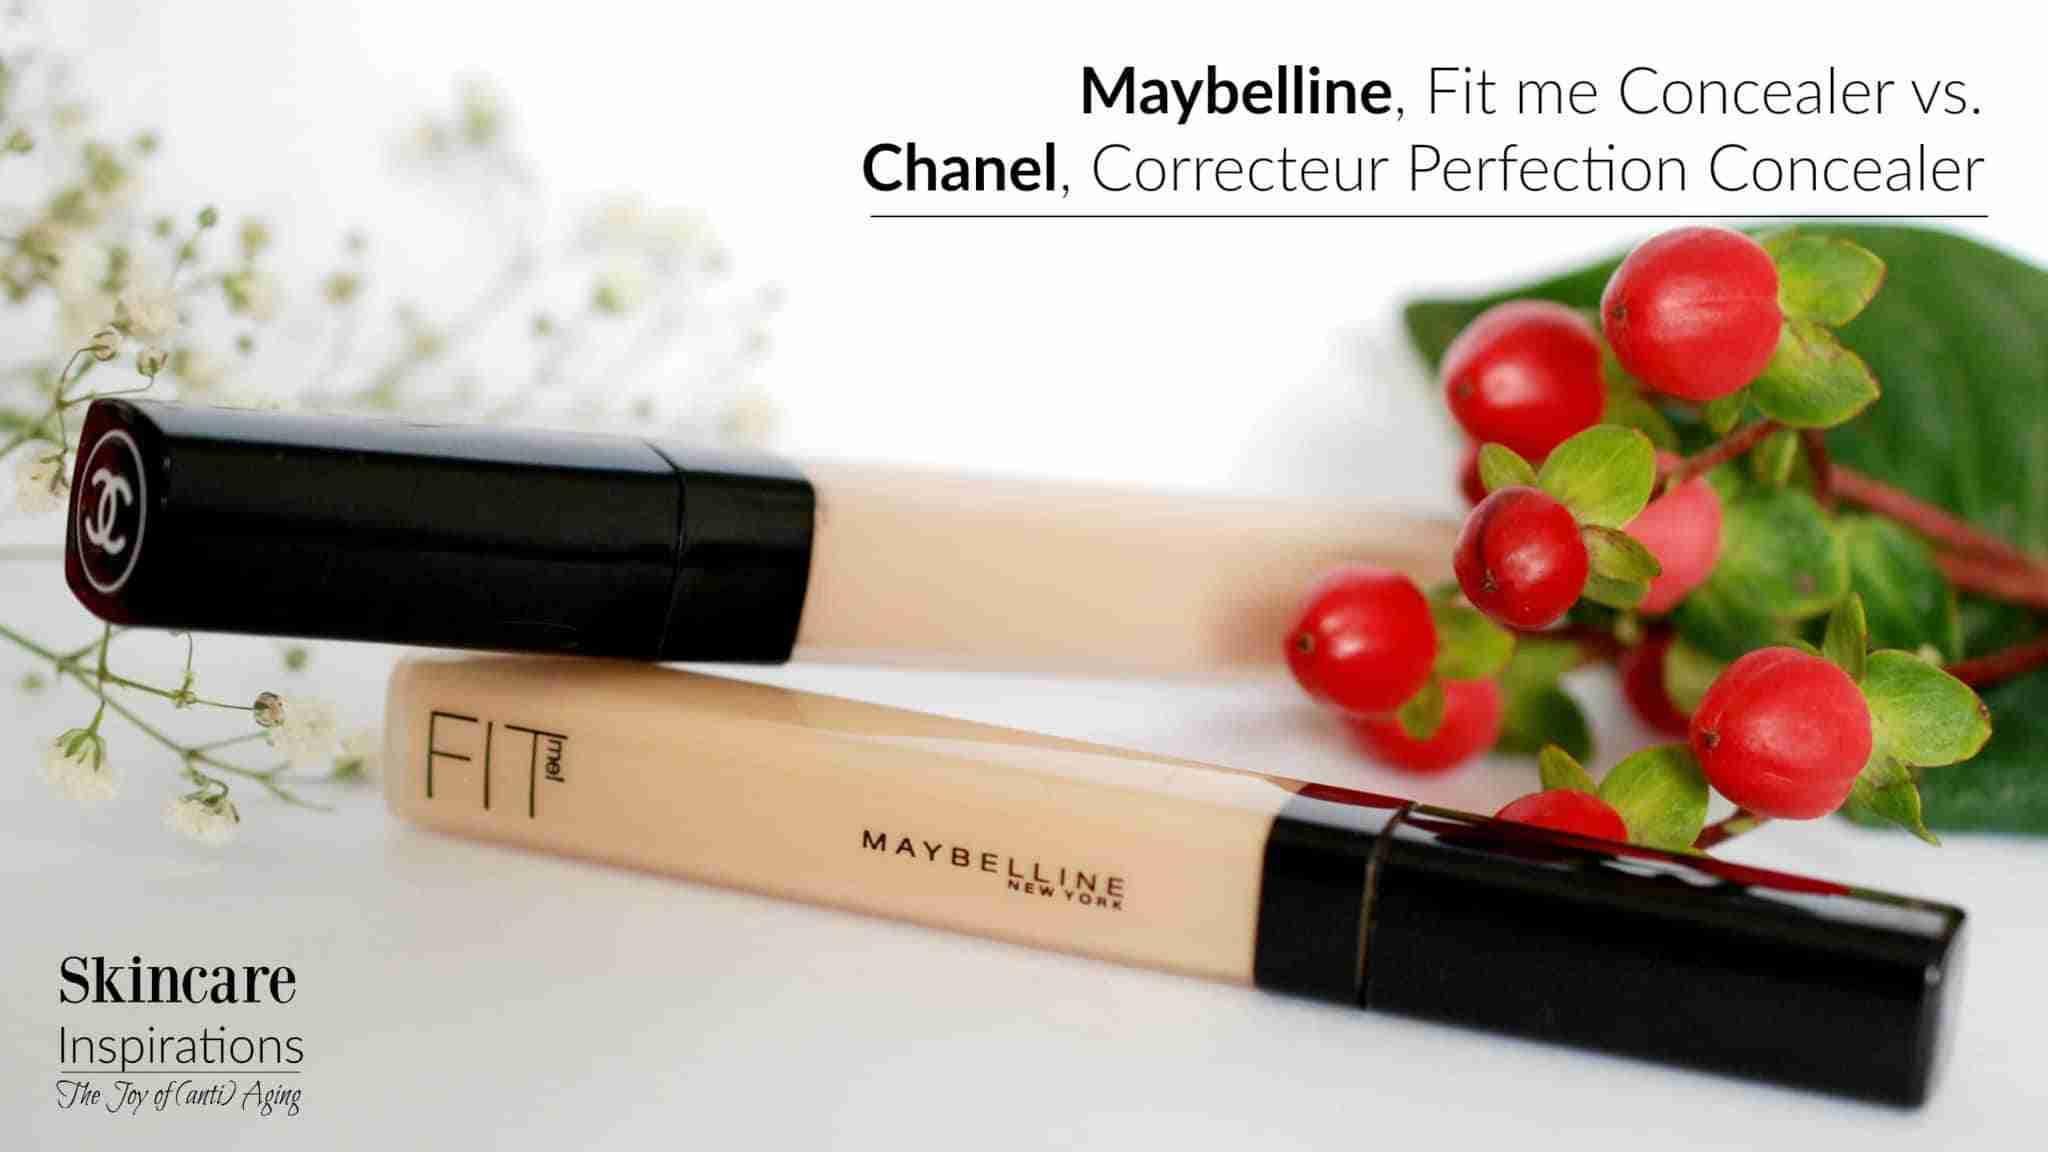 Maybelline Fit me Concealer versus Chanel Correcteur Perfection Concealer